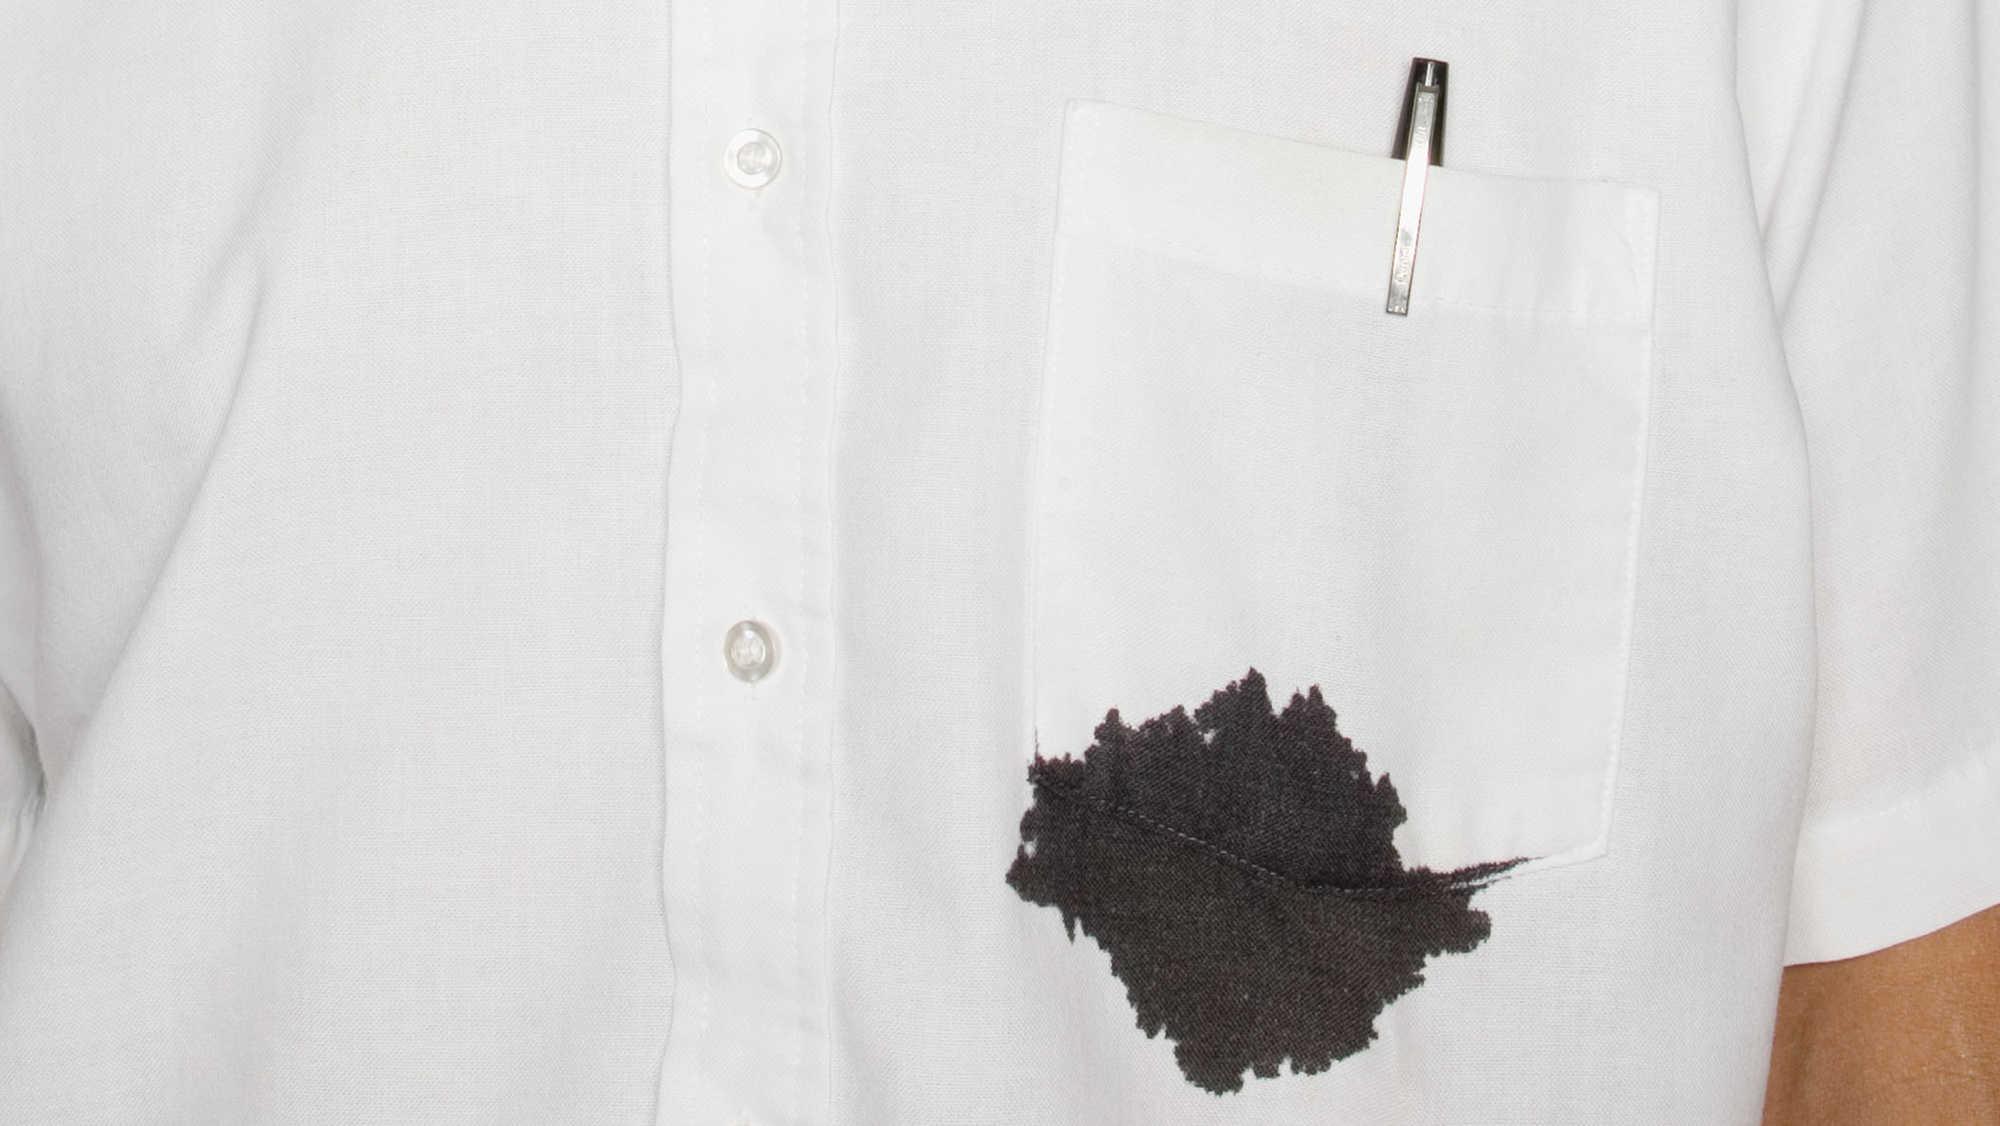 ee4832e99 كيف أنظف الحبر من الثوب الأبيض - موسوعة